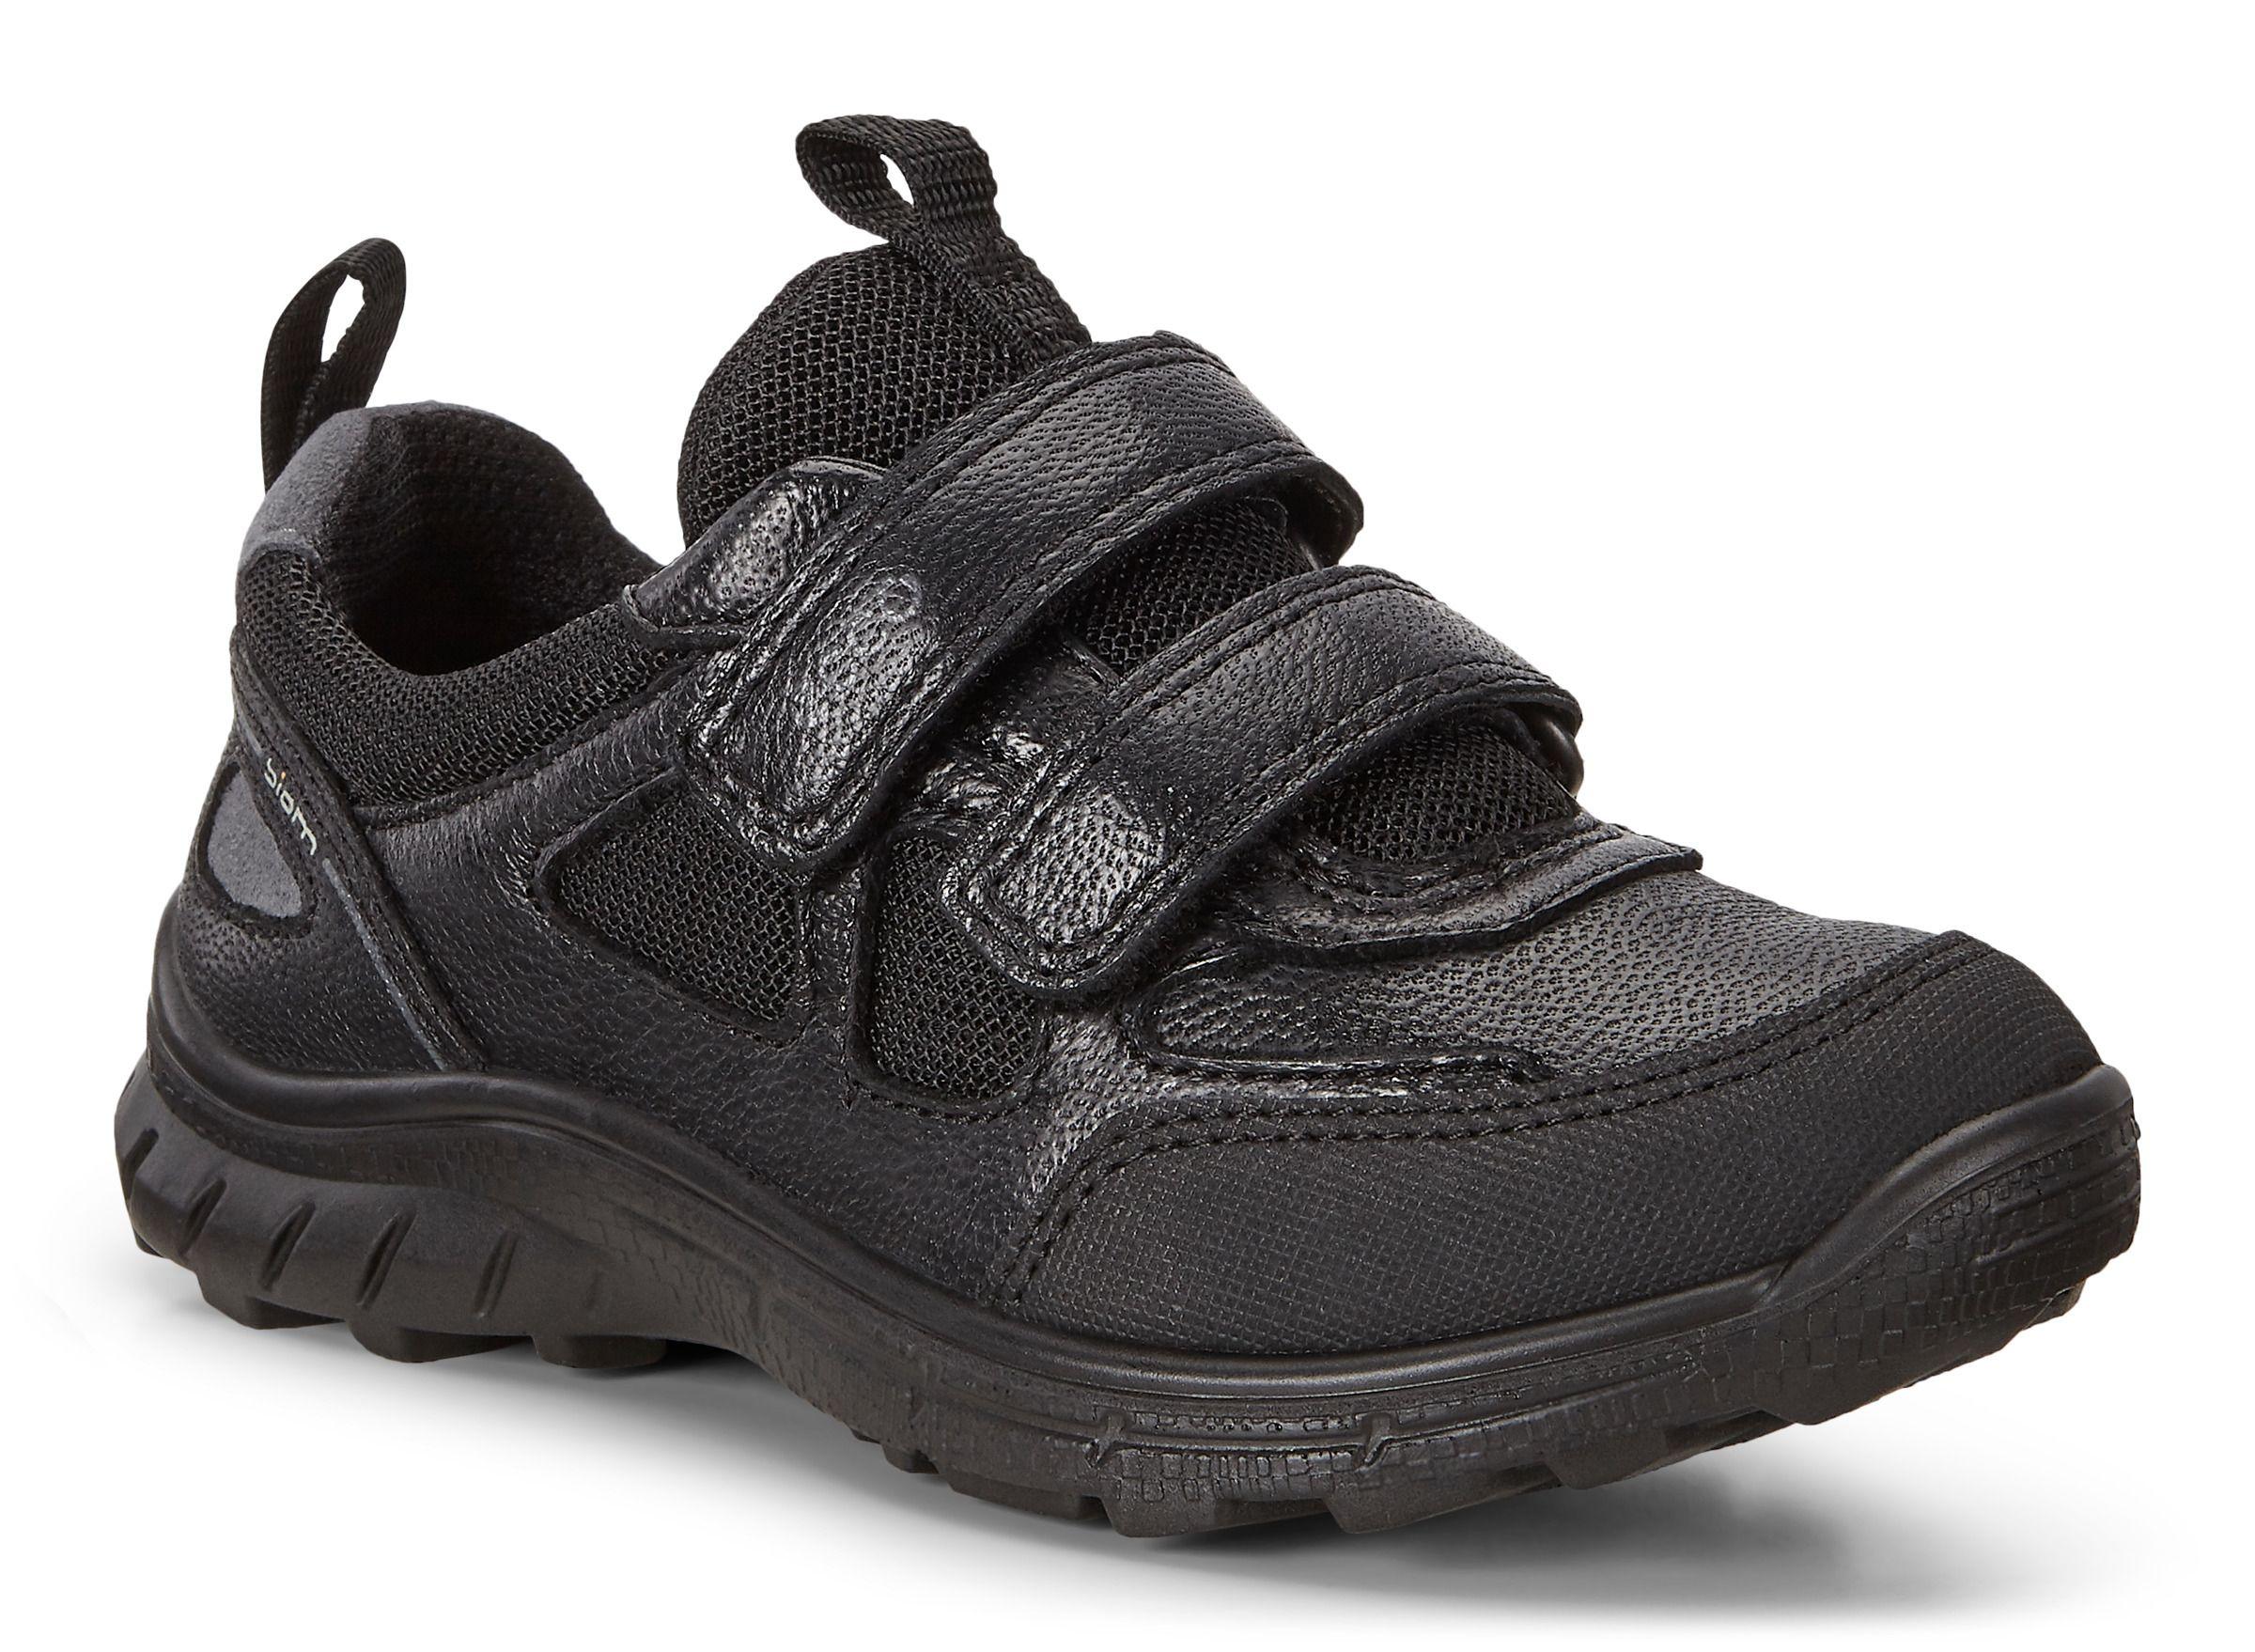 ecco kids shoes